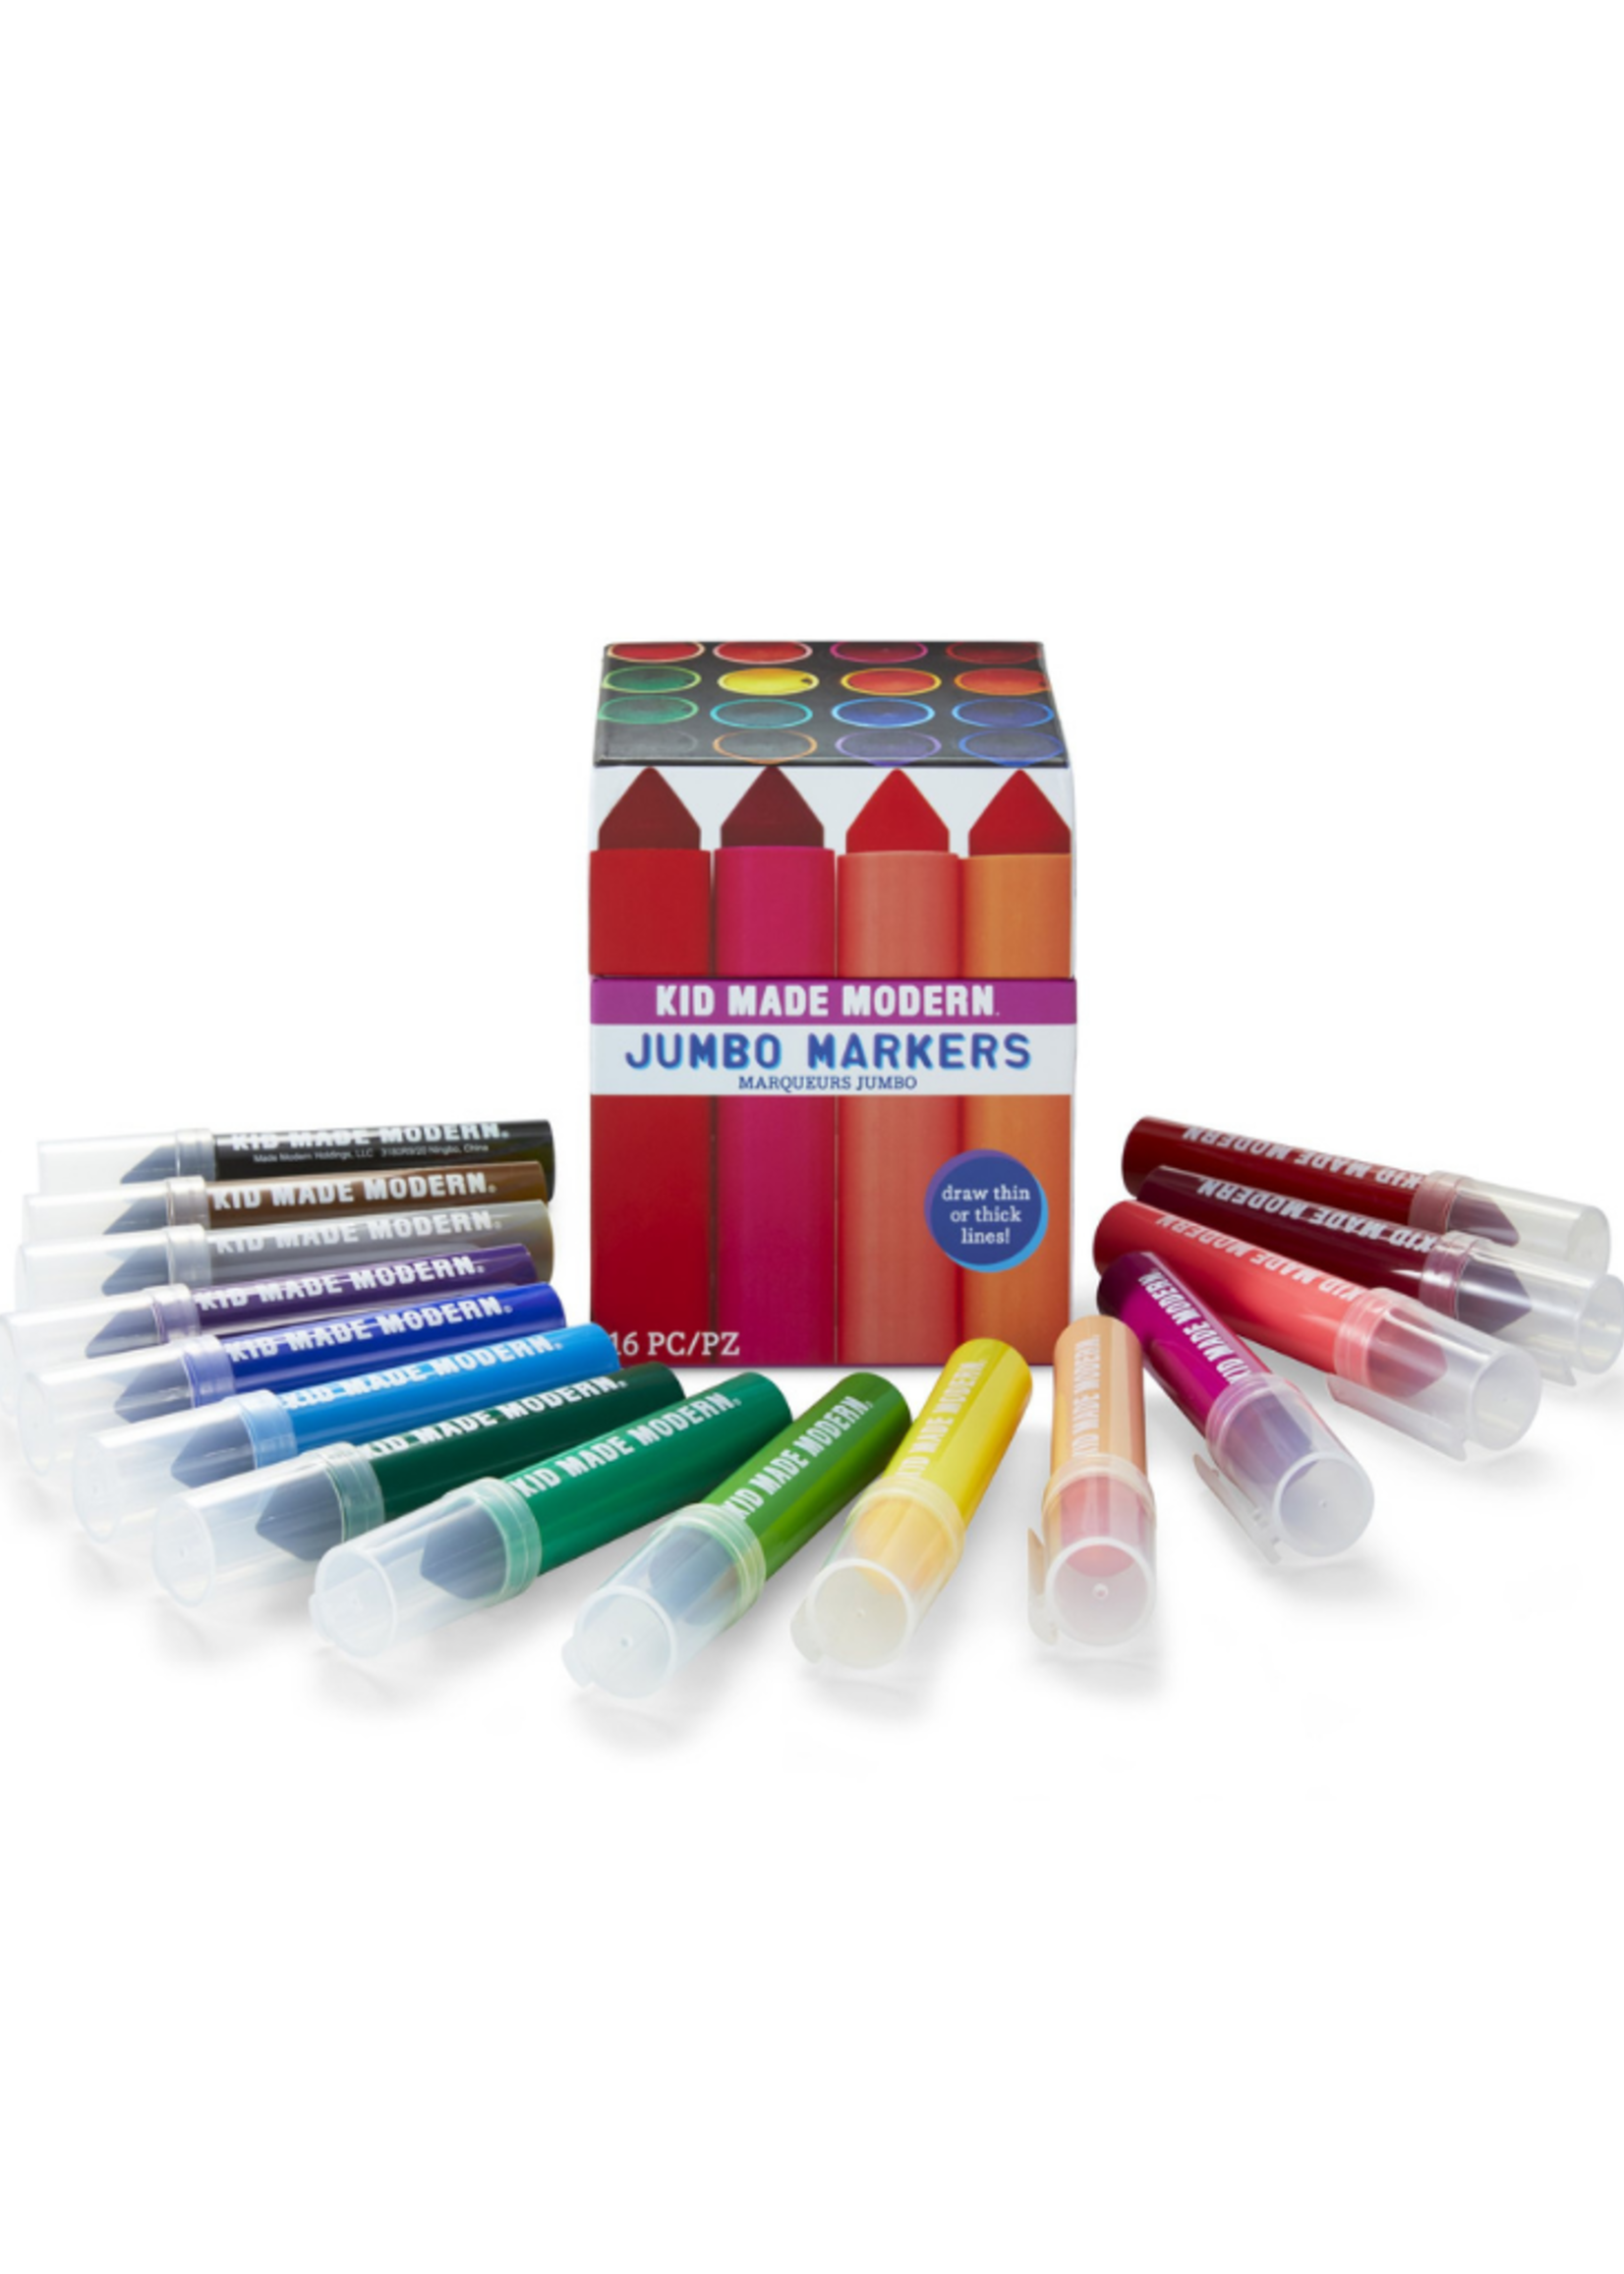 Kids Made Modern Jumbo Markers